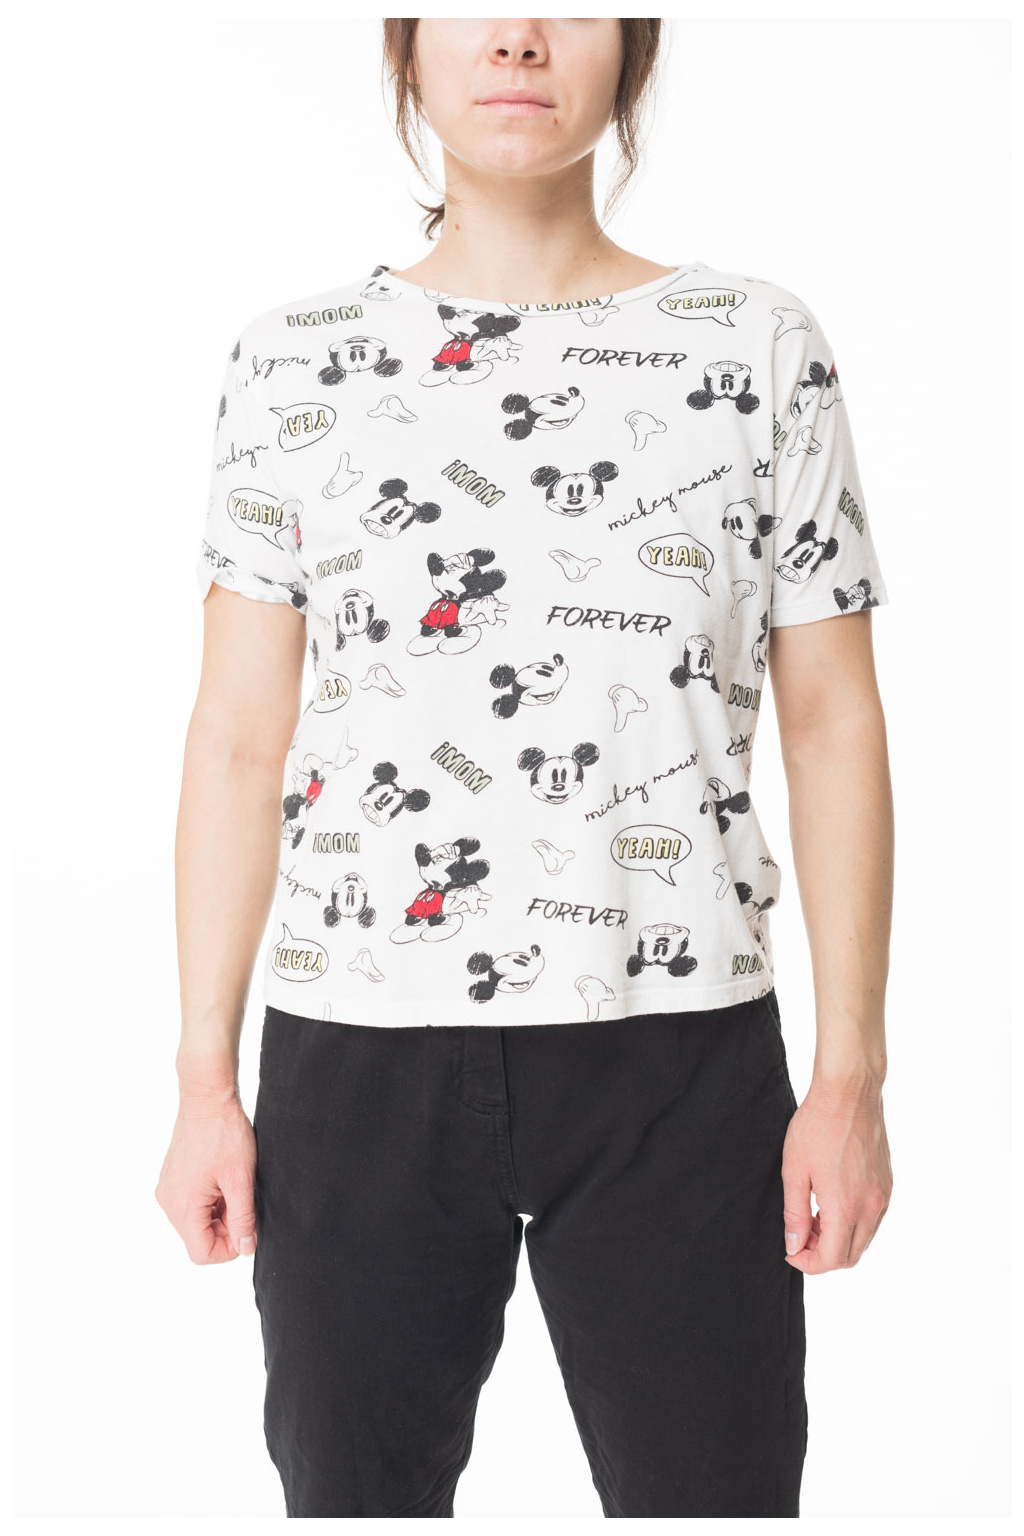 Tričko Vzor